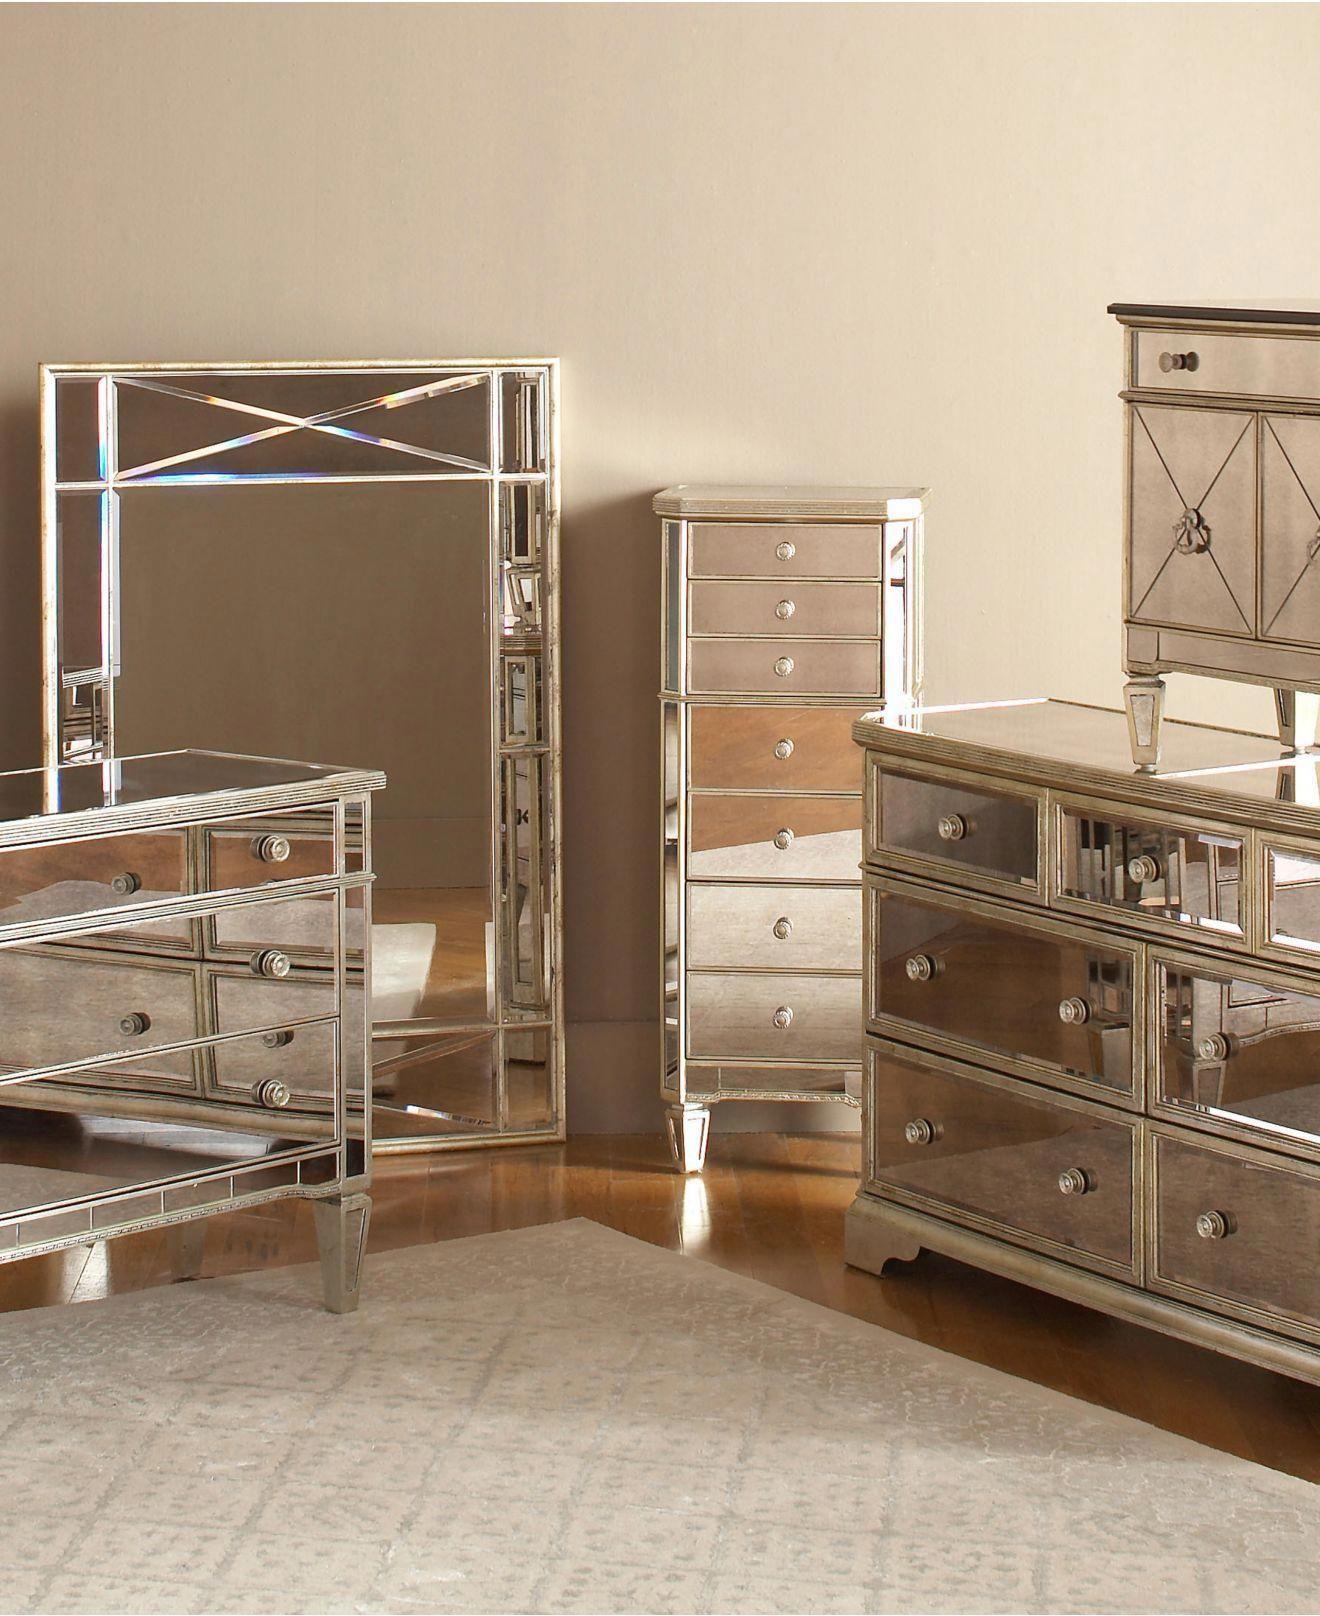 Marais mirrored furniture collection in deck furniture